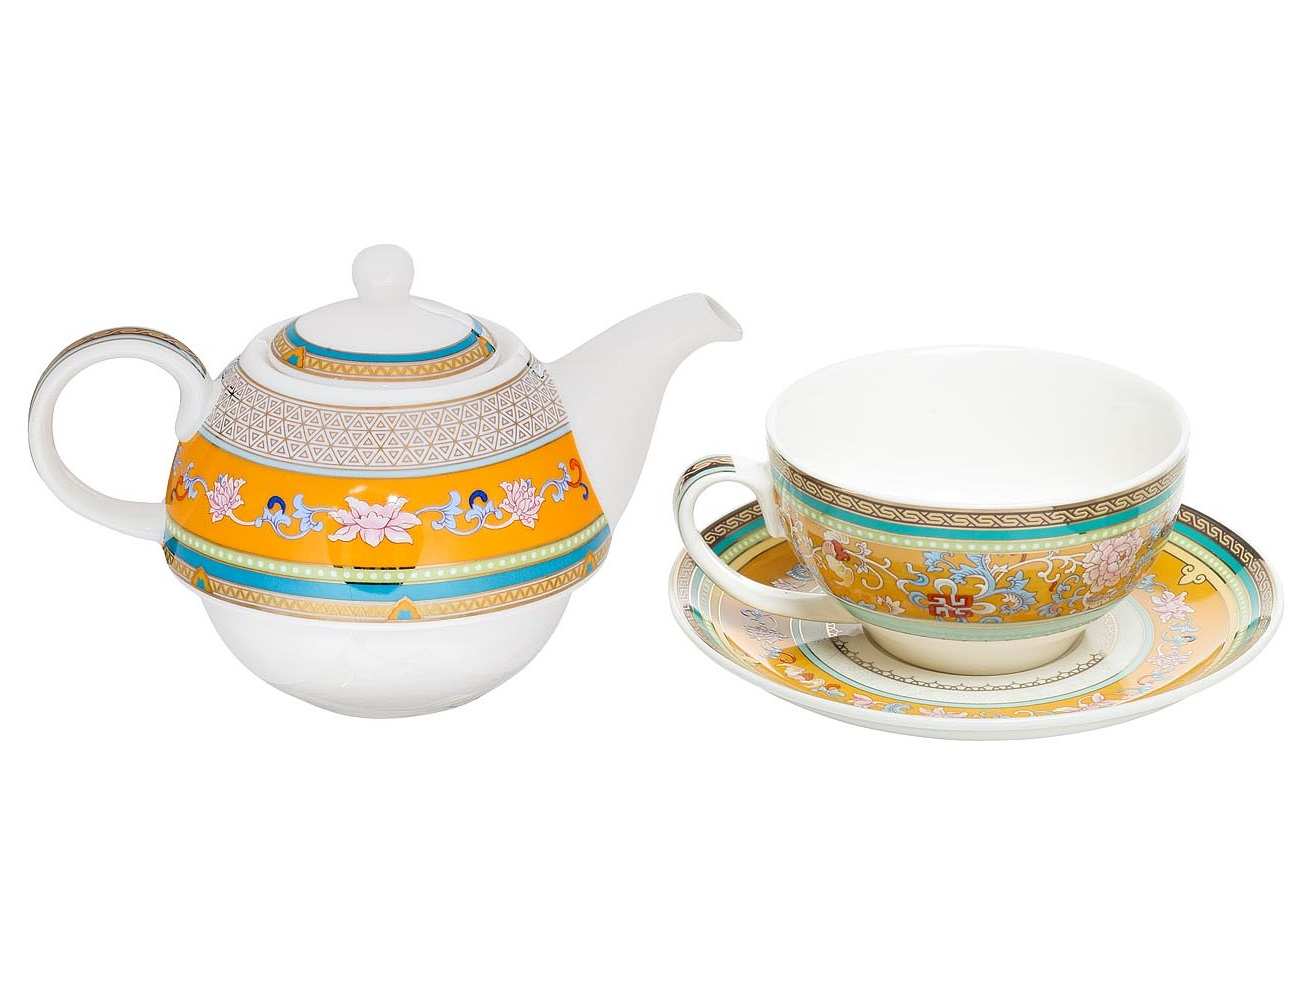 Набор для чая (3 предмета)Чайные сервизы<br>В наборе чайник заварочный 12х11х11, чашка 6,5х11х11, блюдце 2х16х16.<br><br>Material: Фарфор<br>Width см: 11<br>Depth см: 11<br>Height см: 12